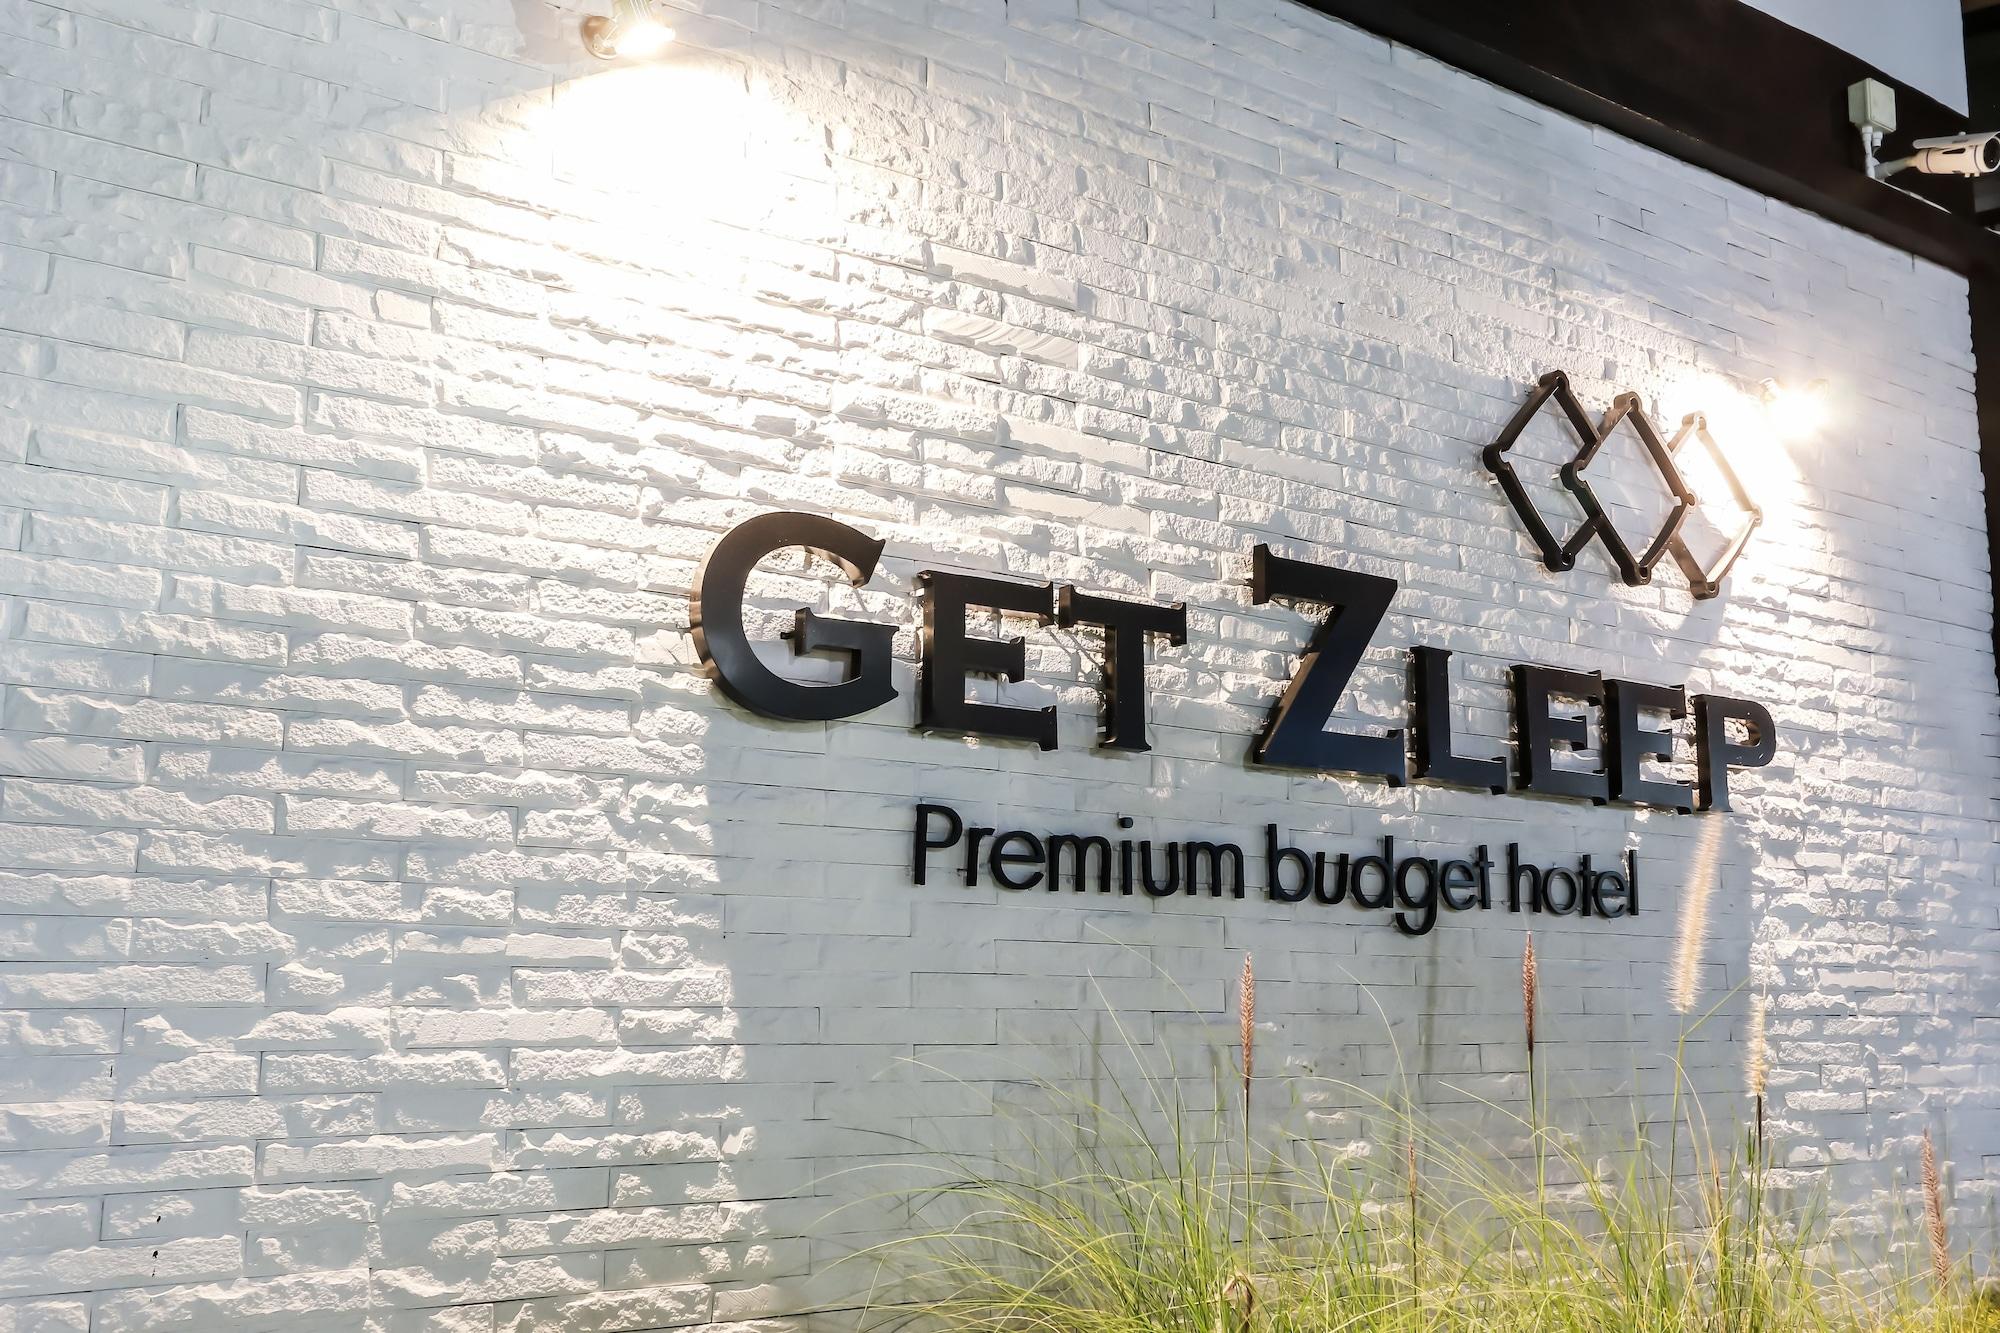 Get Zleep Premium Budget Hotel, Muang Chiang Mai